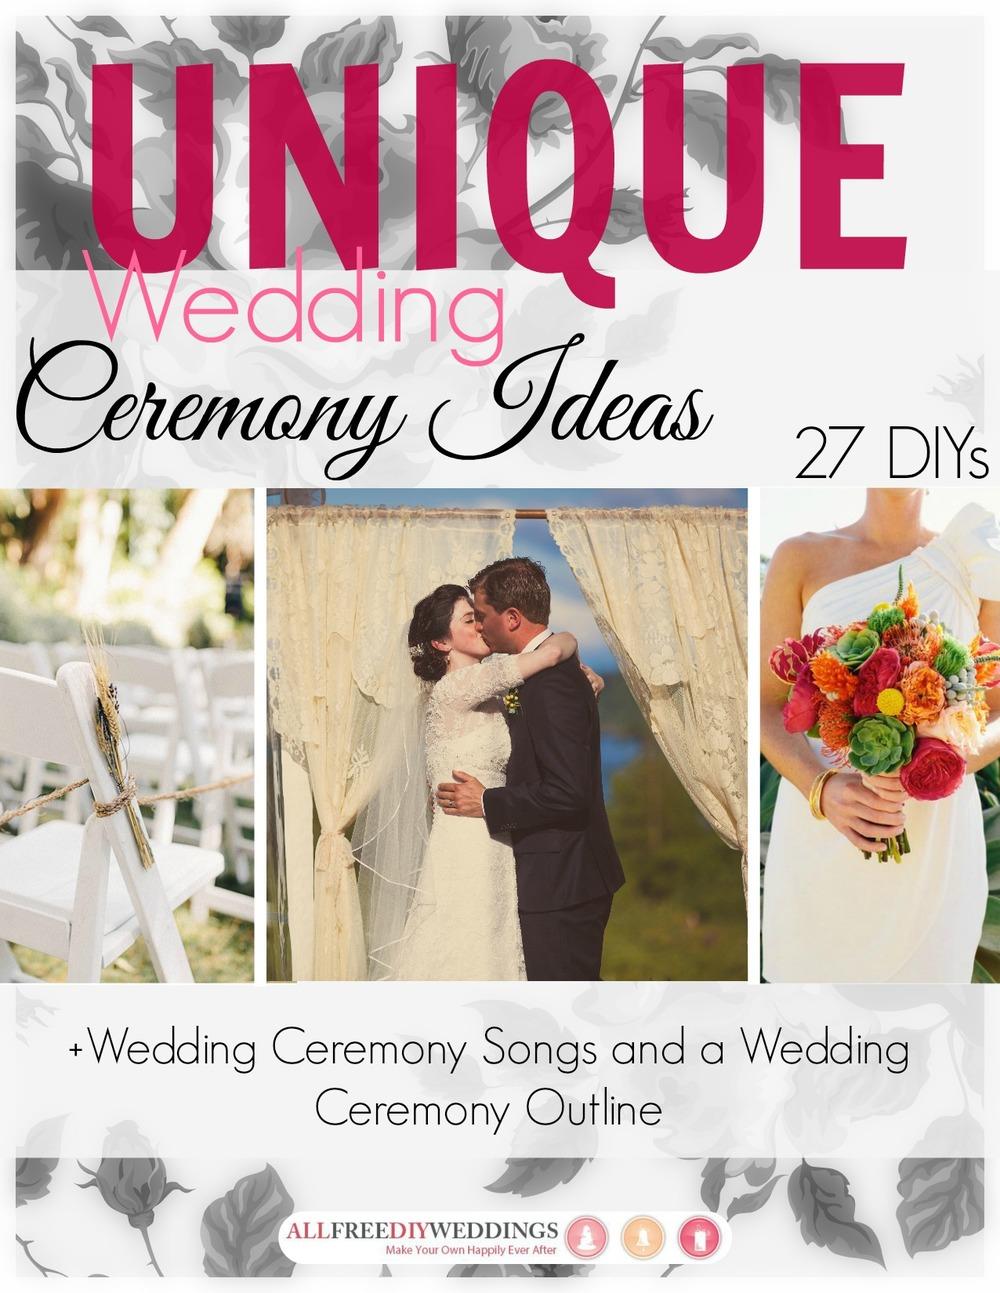 Unique Wedding Ceremony Ideas: 27 DIYs + Wedding Ceremony ...